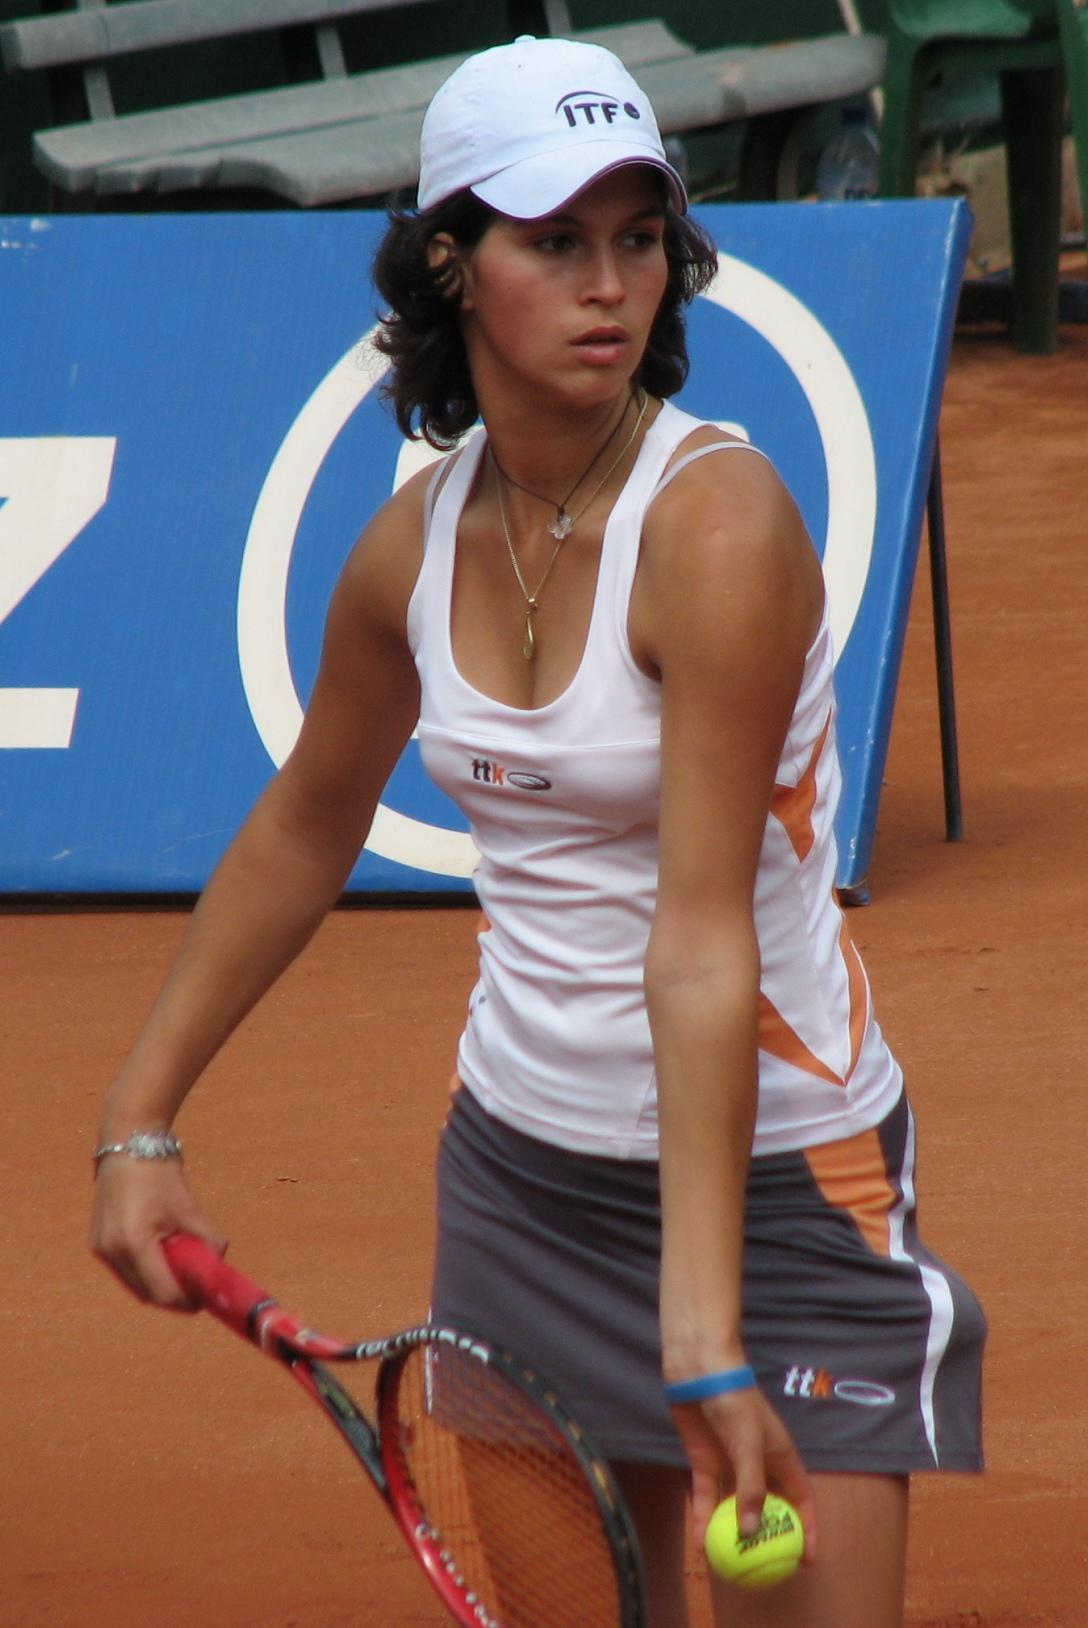 Isabella Shinikova